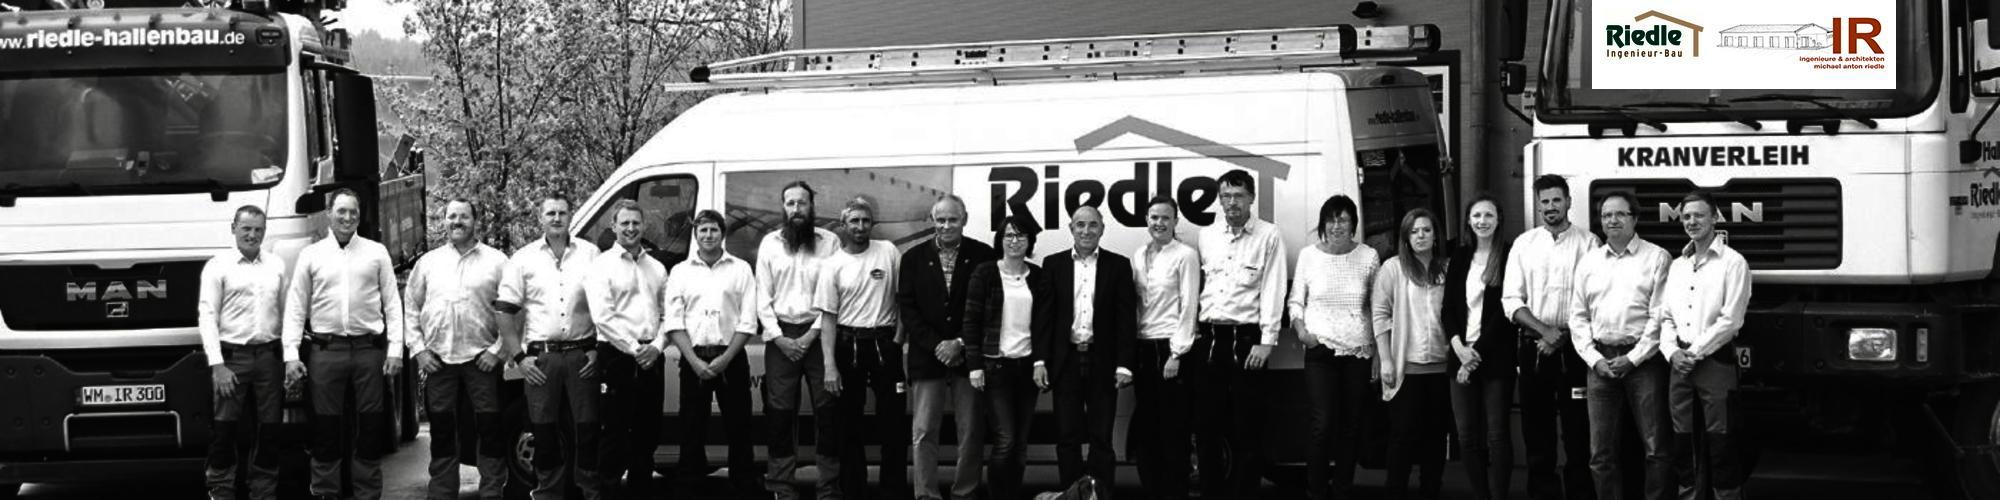 Riedle Ingenieur-Bau GmbH